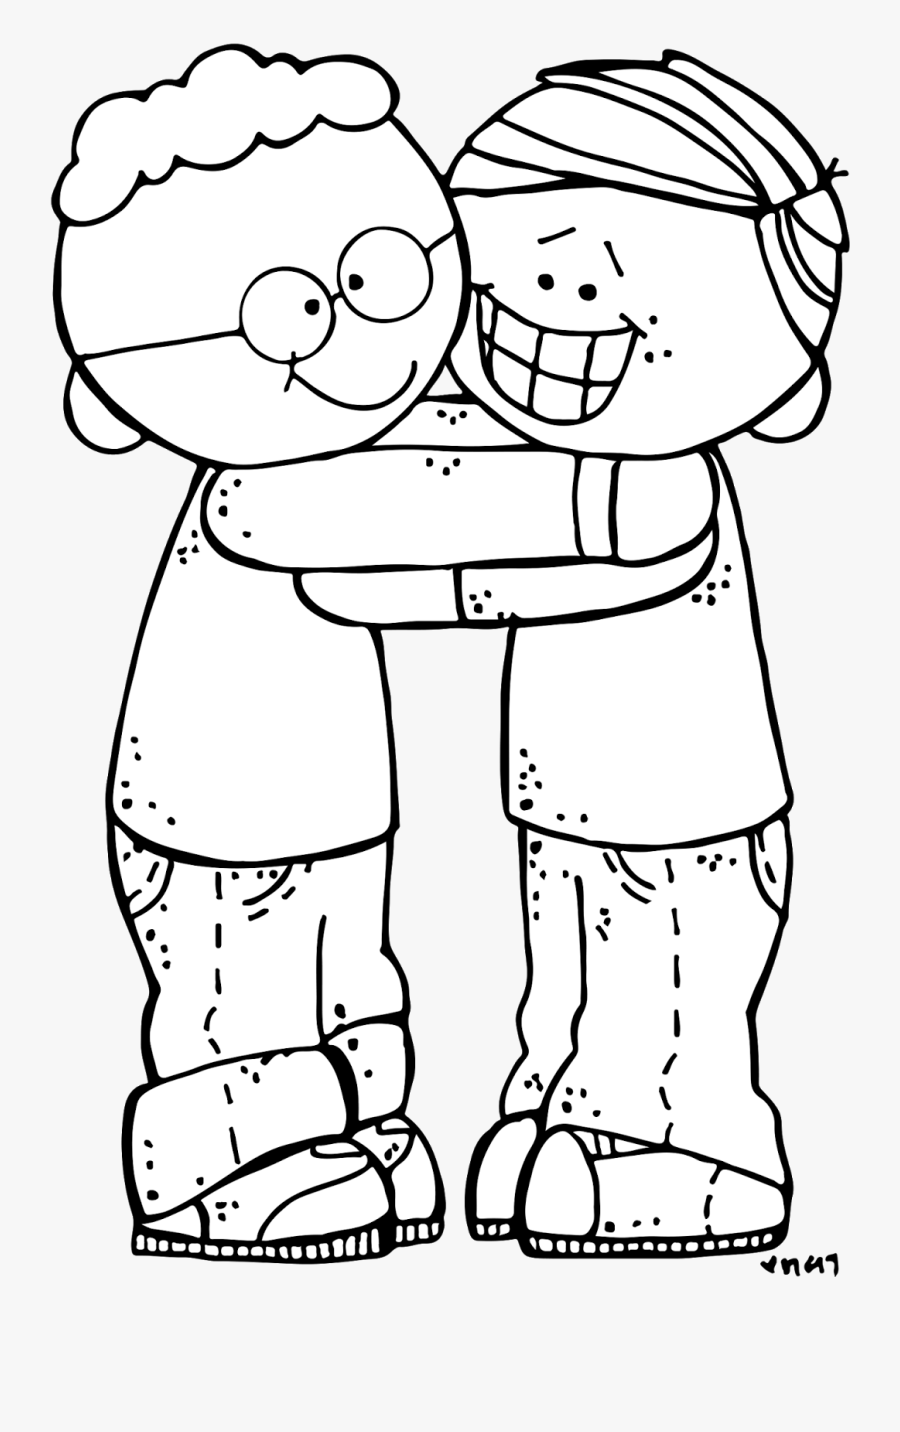 Forgiveness Clipart Love Thy Neighbor - Cartoon, Transparent Clipart